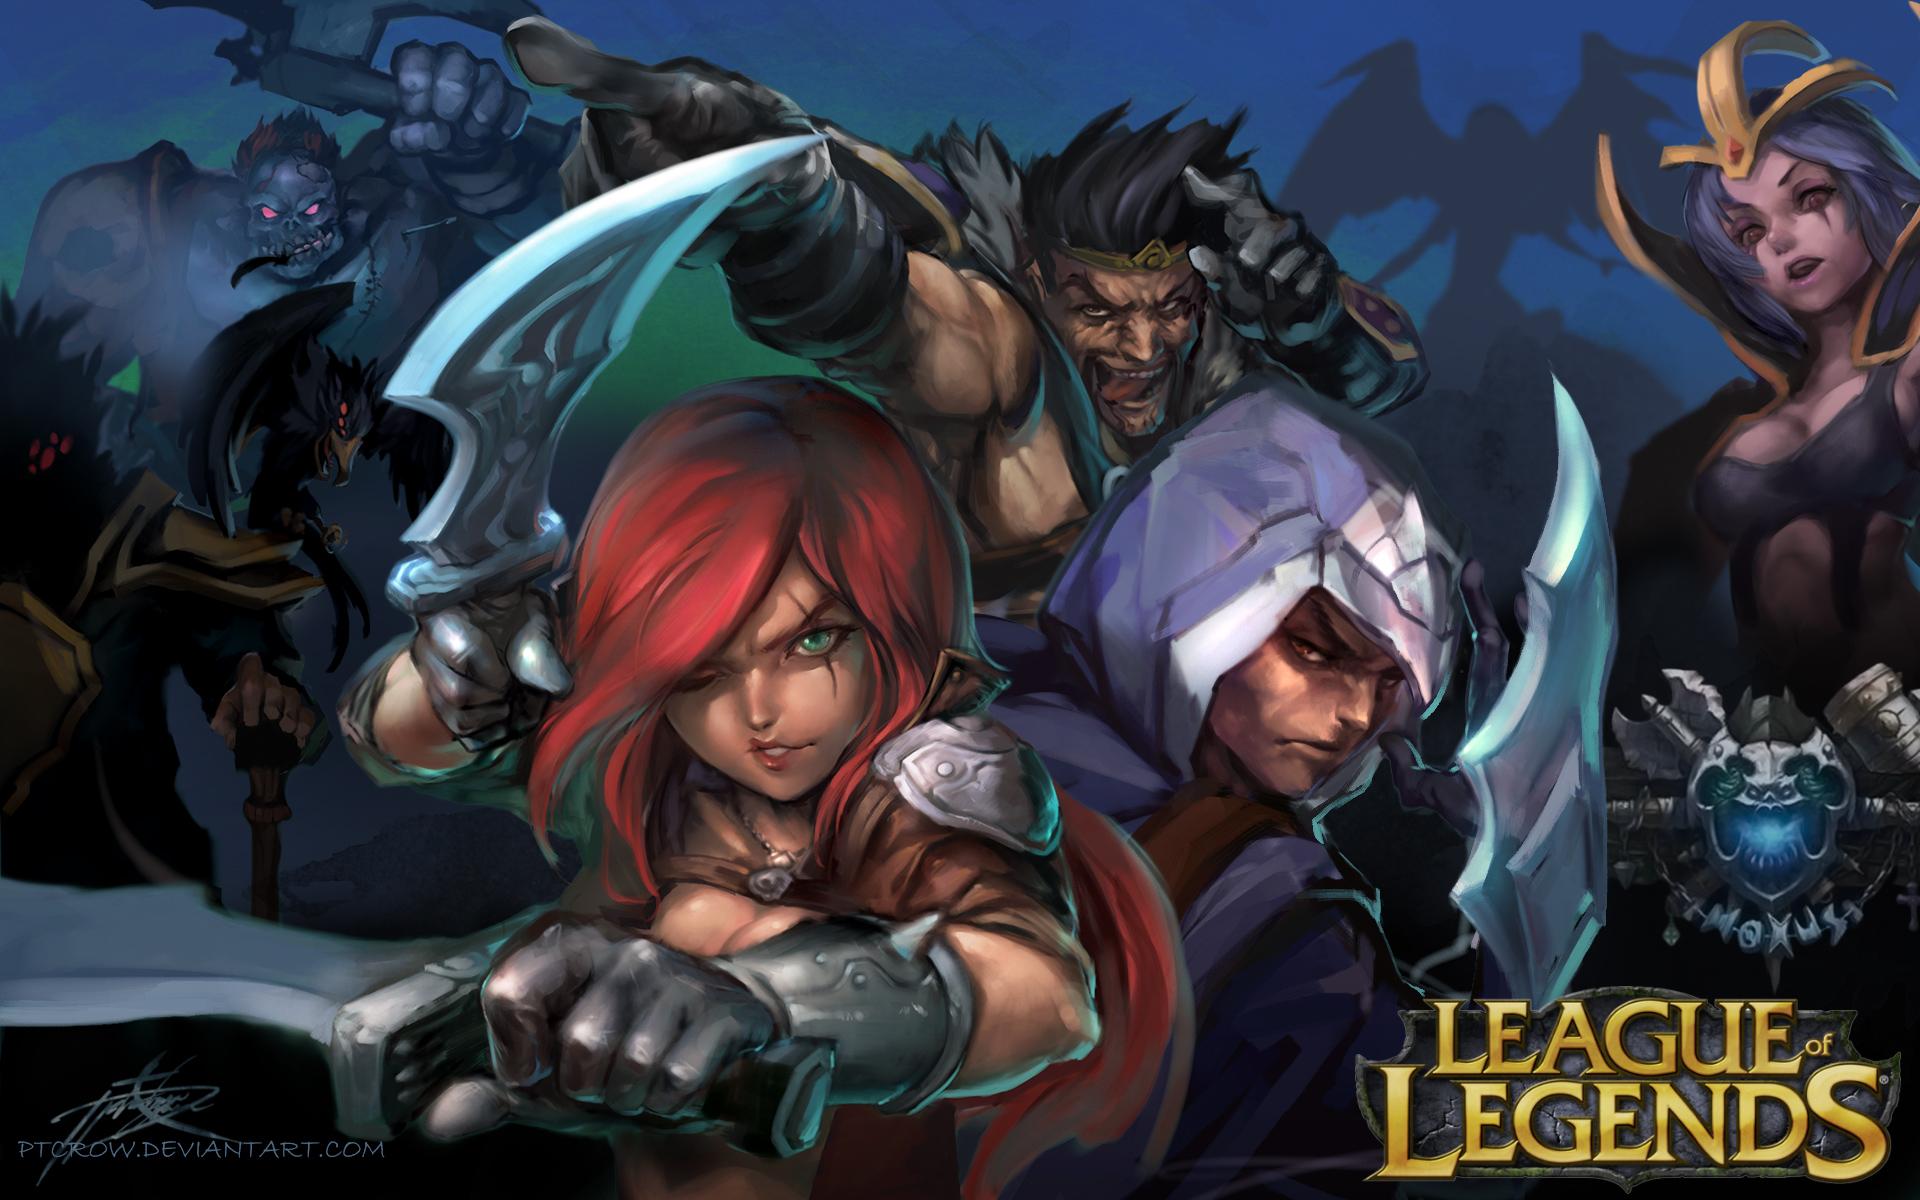 talon draven leblanc morgana swain sion noxus league of legends    League Of Legends Noxus Logo